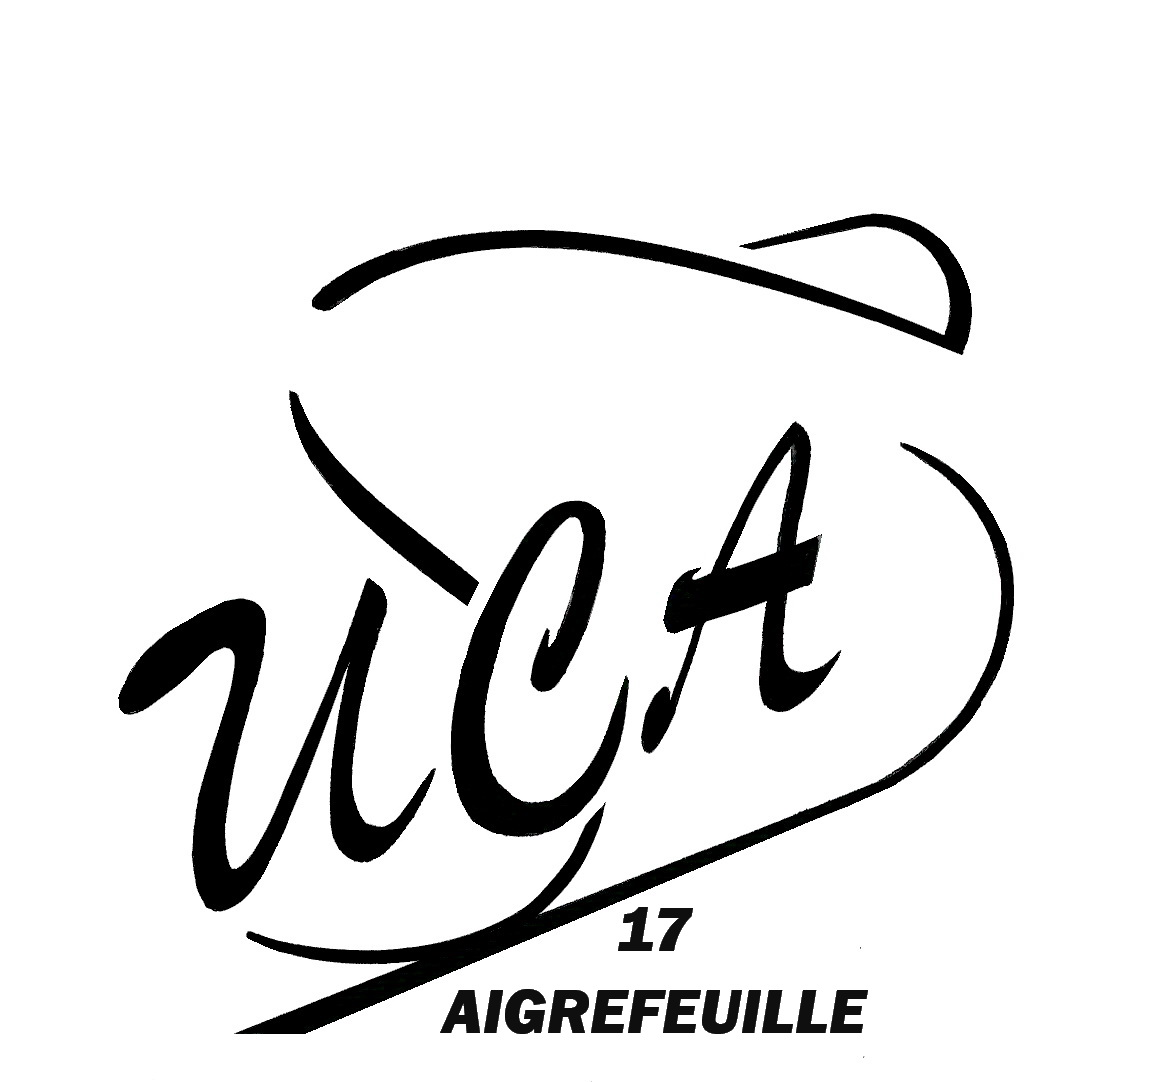 UCA-MASTER-AIGREFEUILLE.jpg